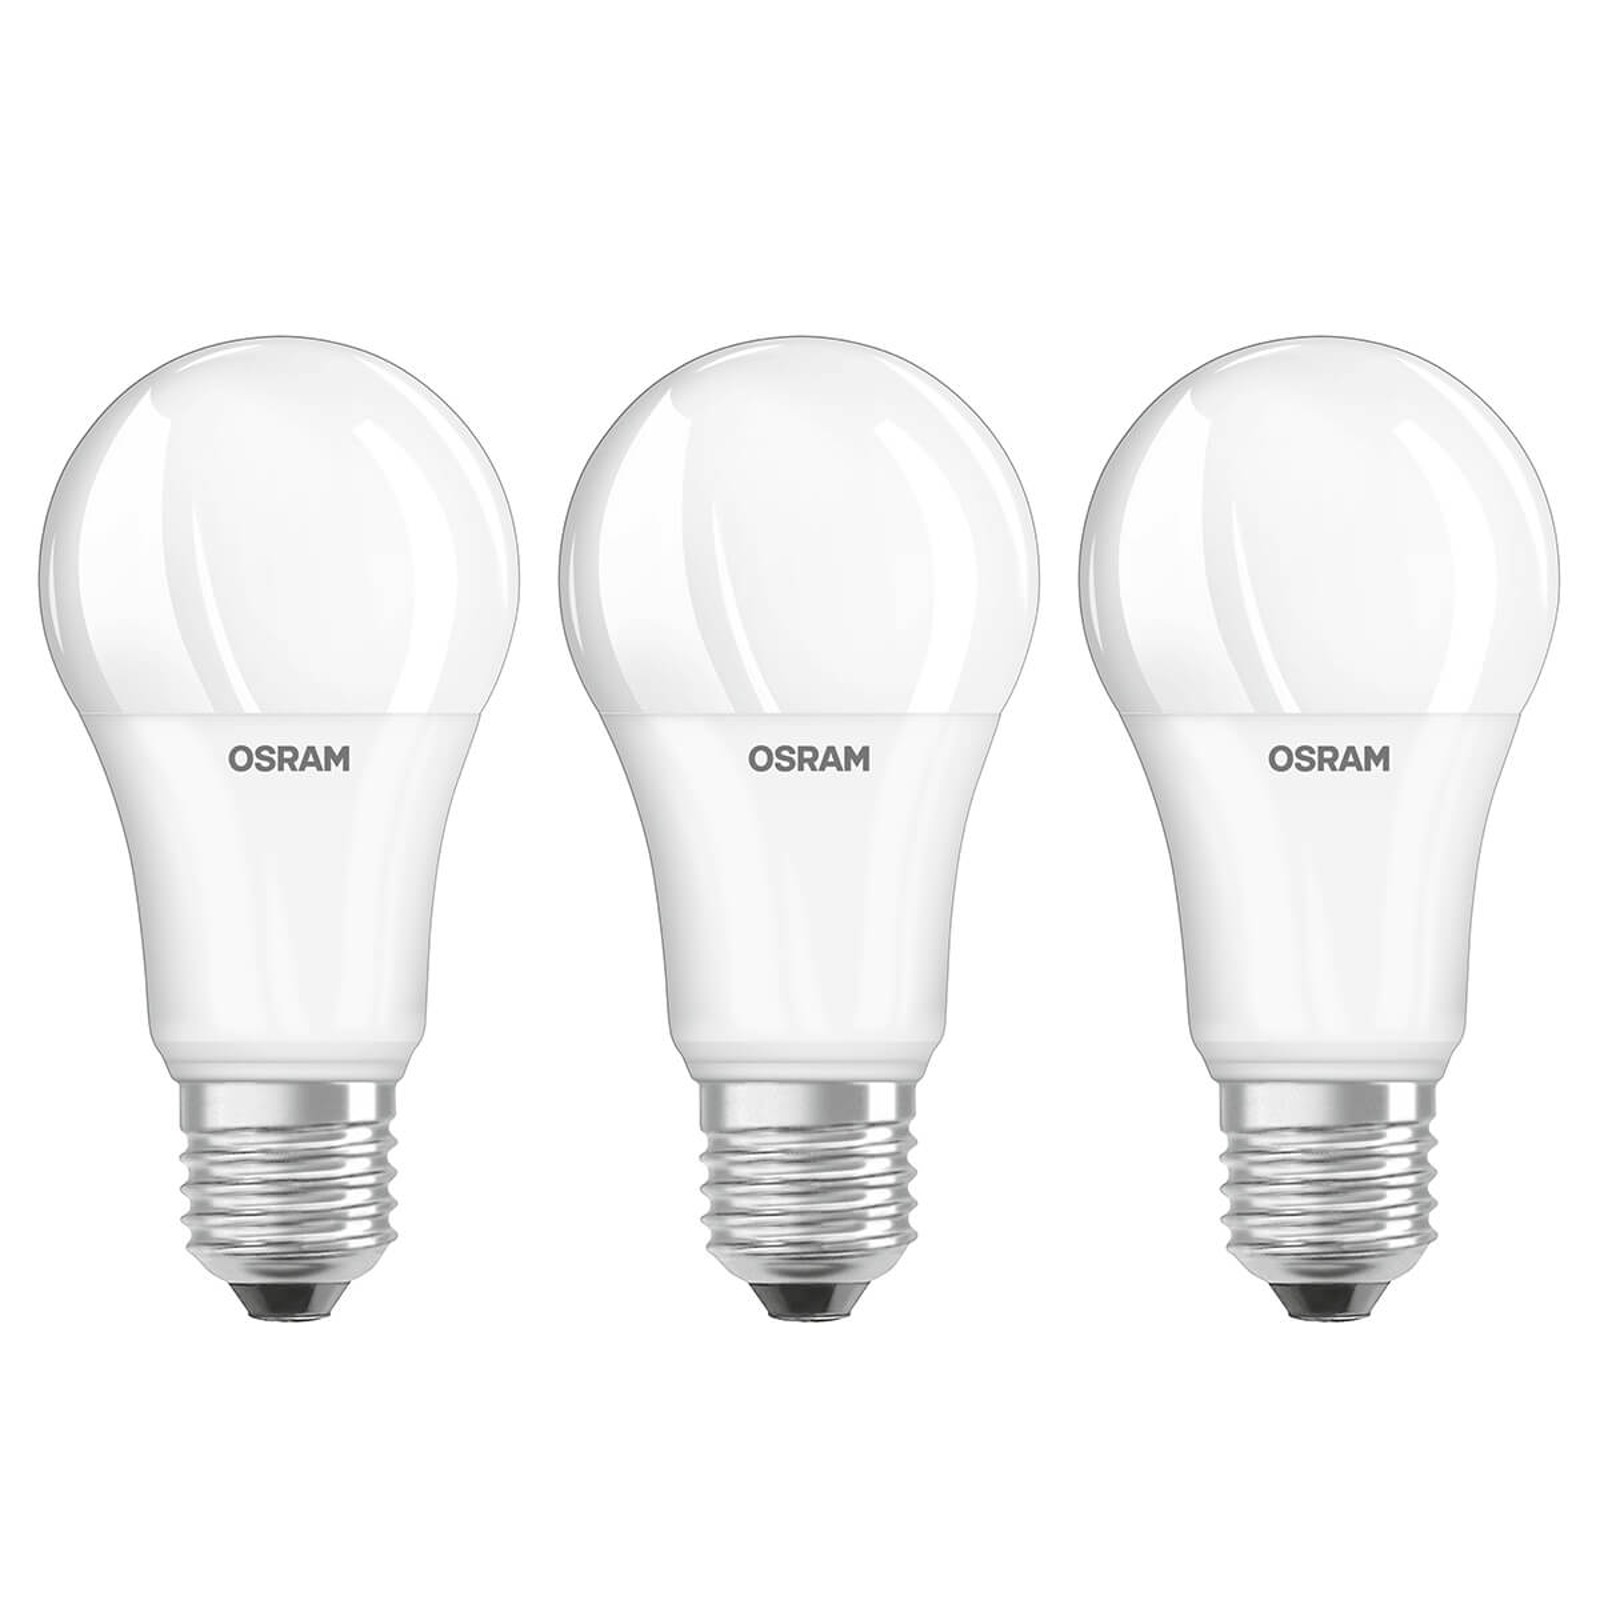 LED lamp E27 14W, warmwit, set v. 3